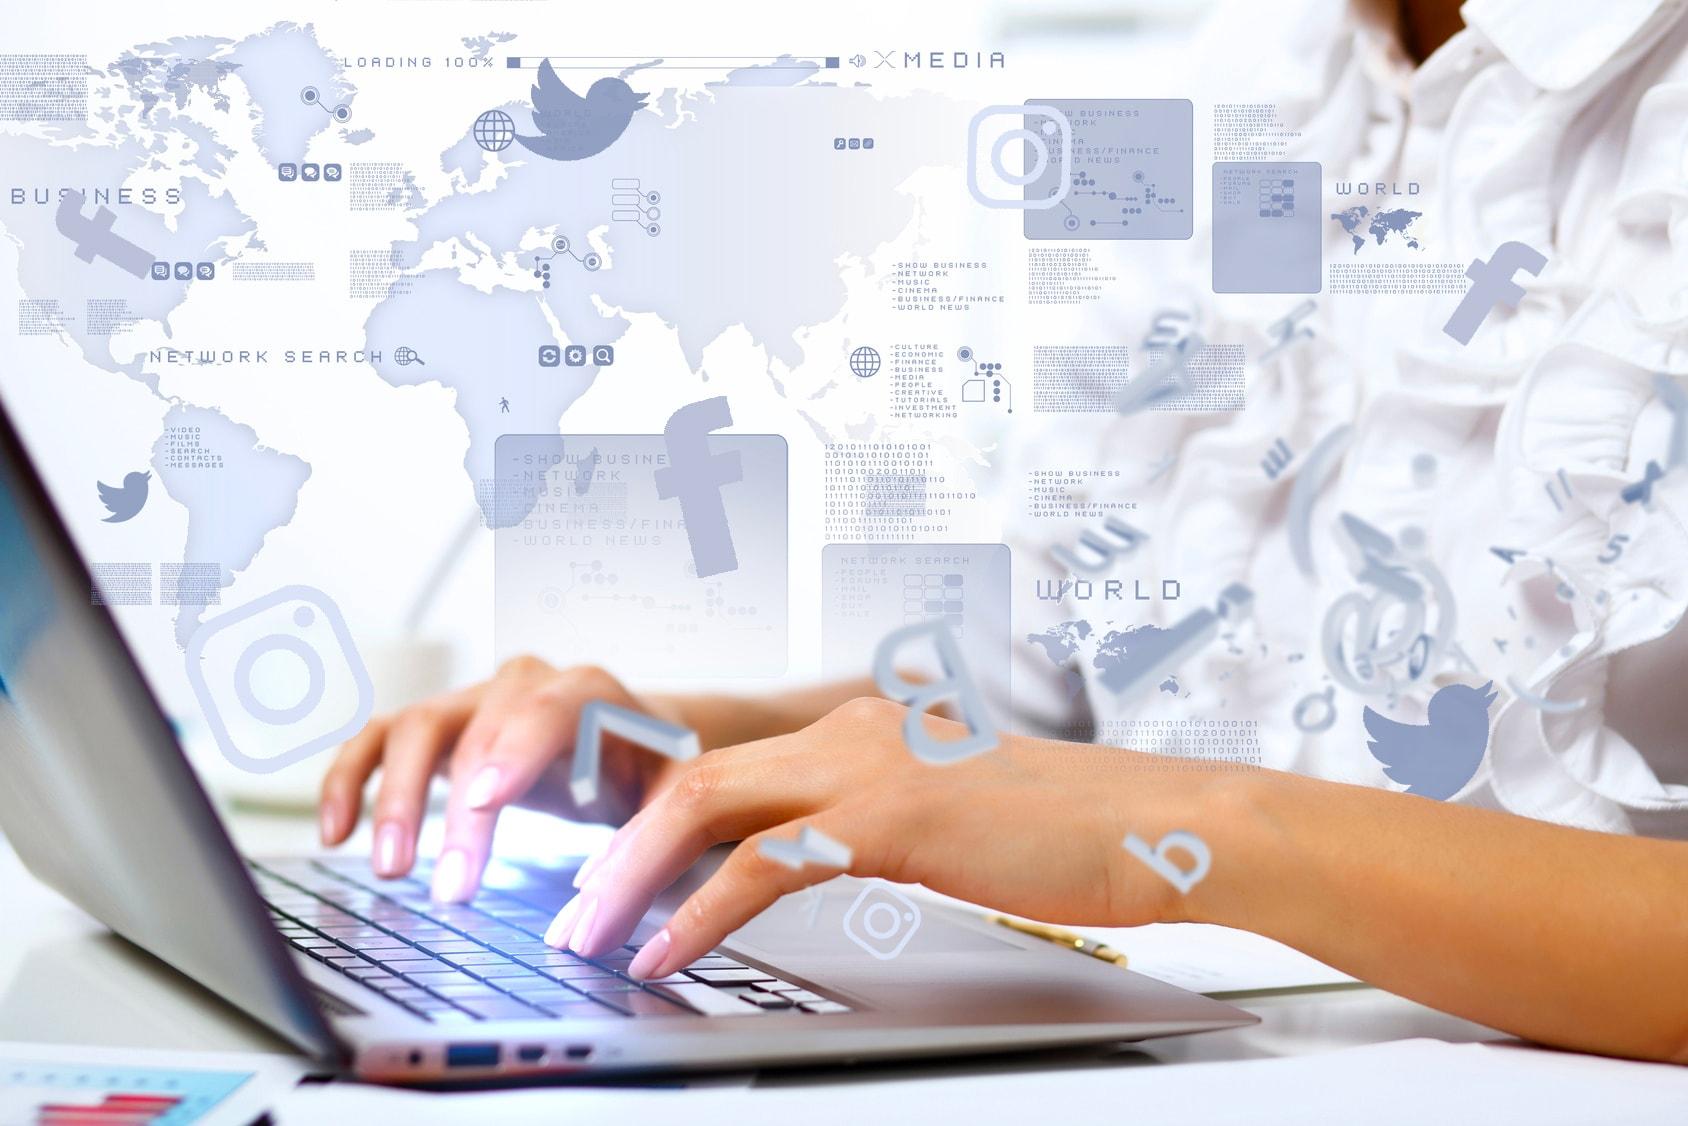 strategie social per ecommerce ecommerceagency